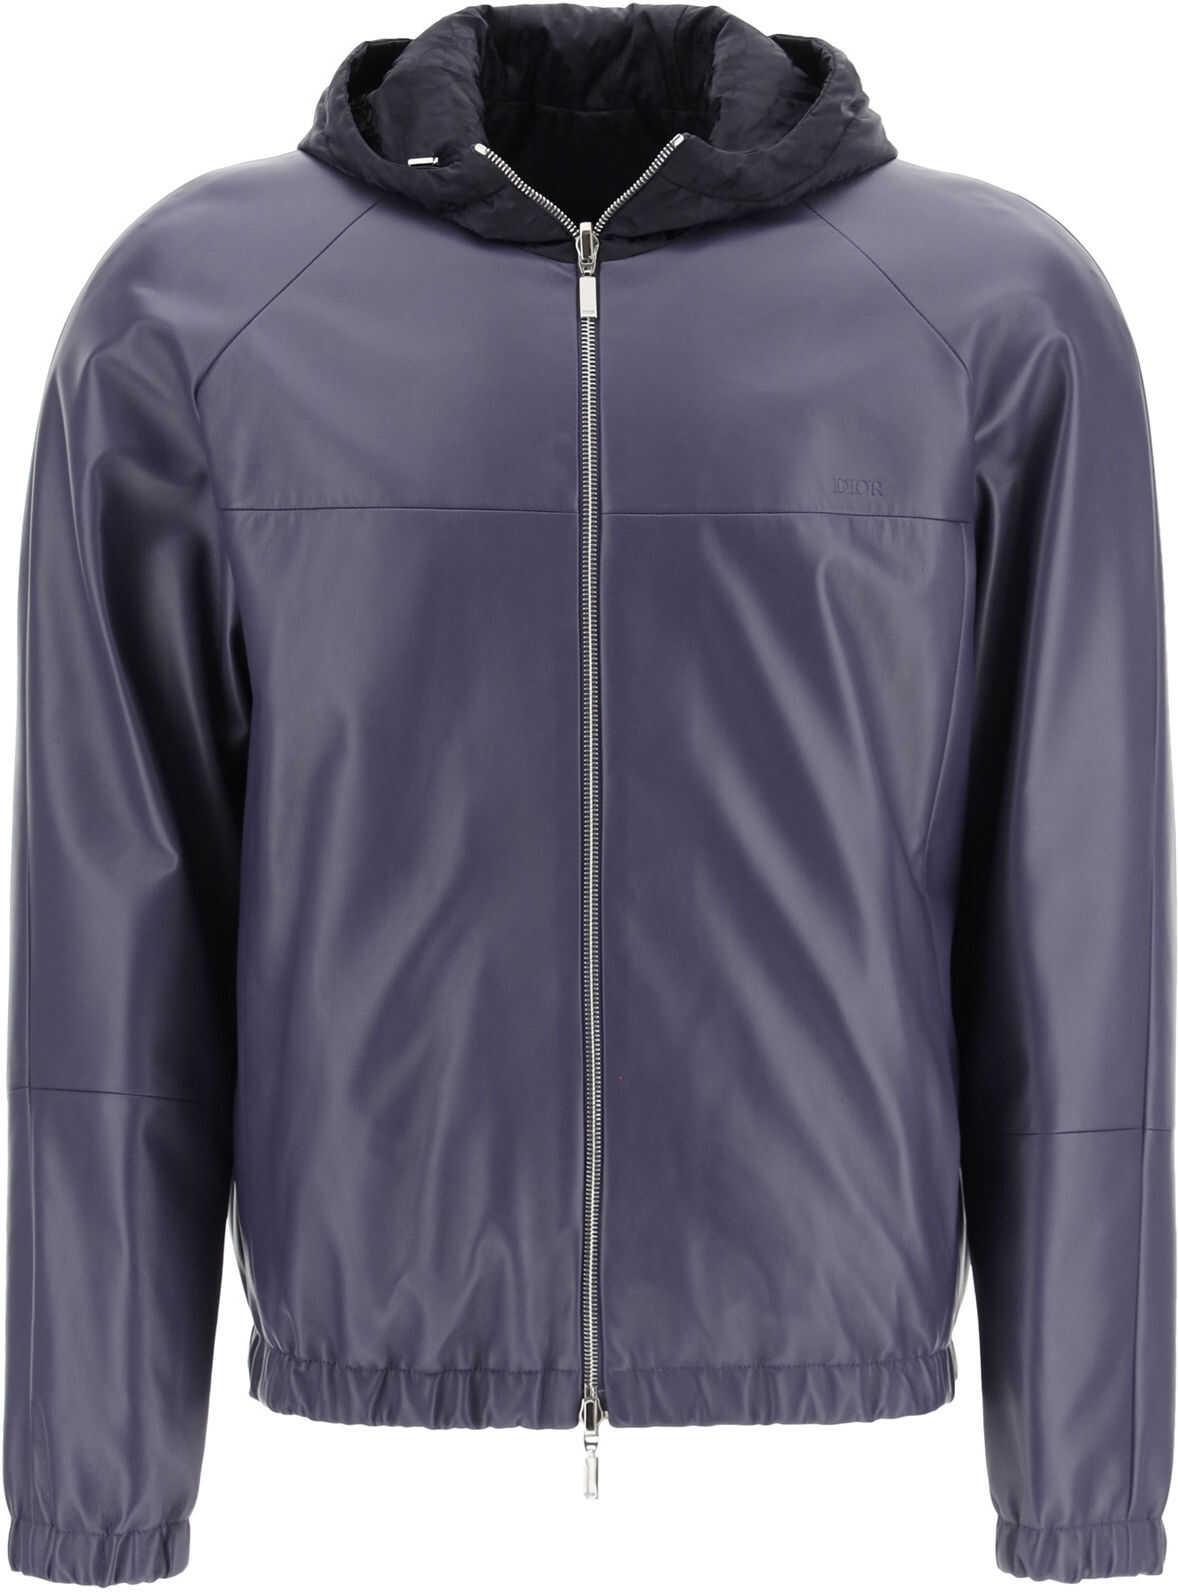 Dior Oblique Reversible Leather Jacket PINK PURPLE imagine